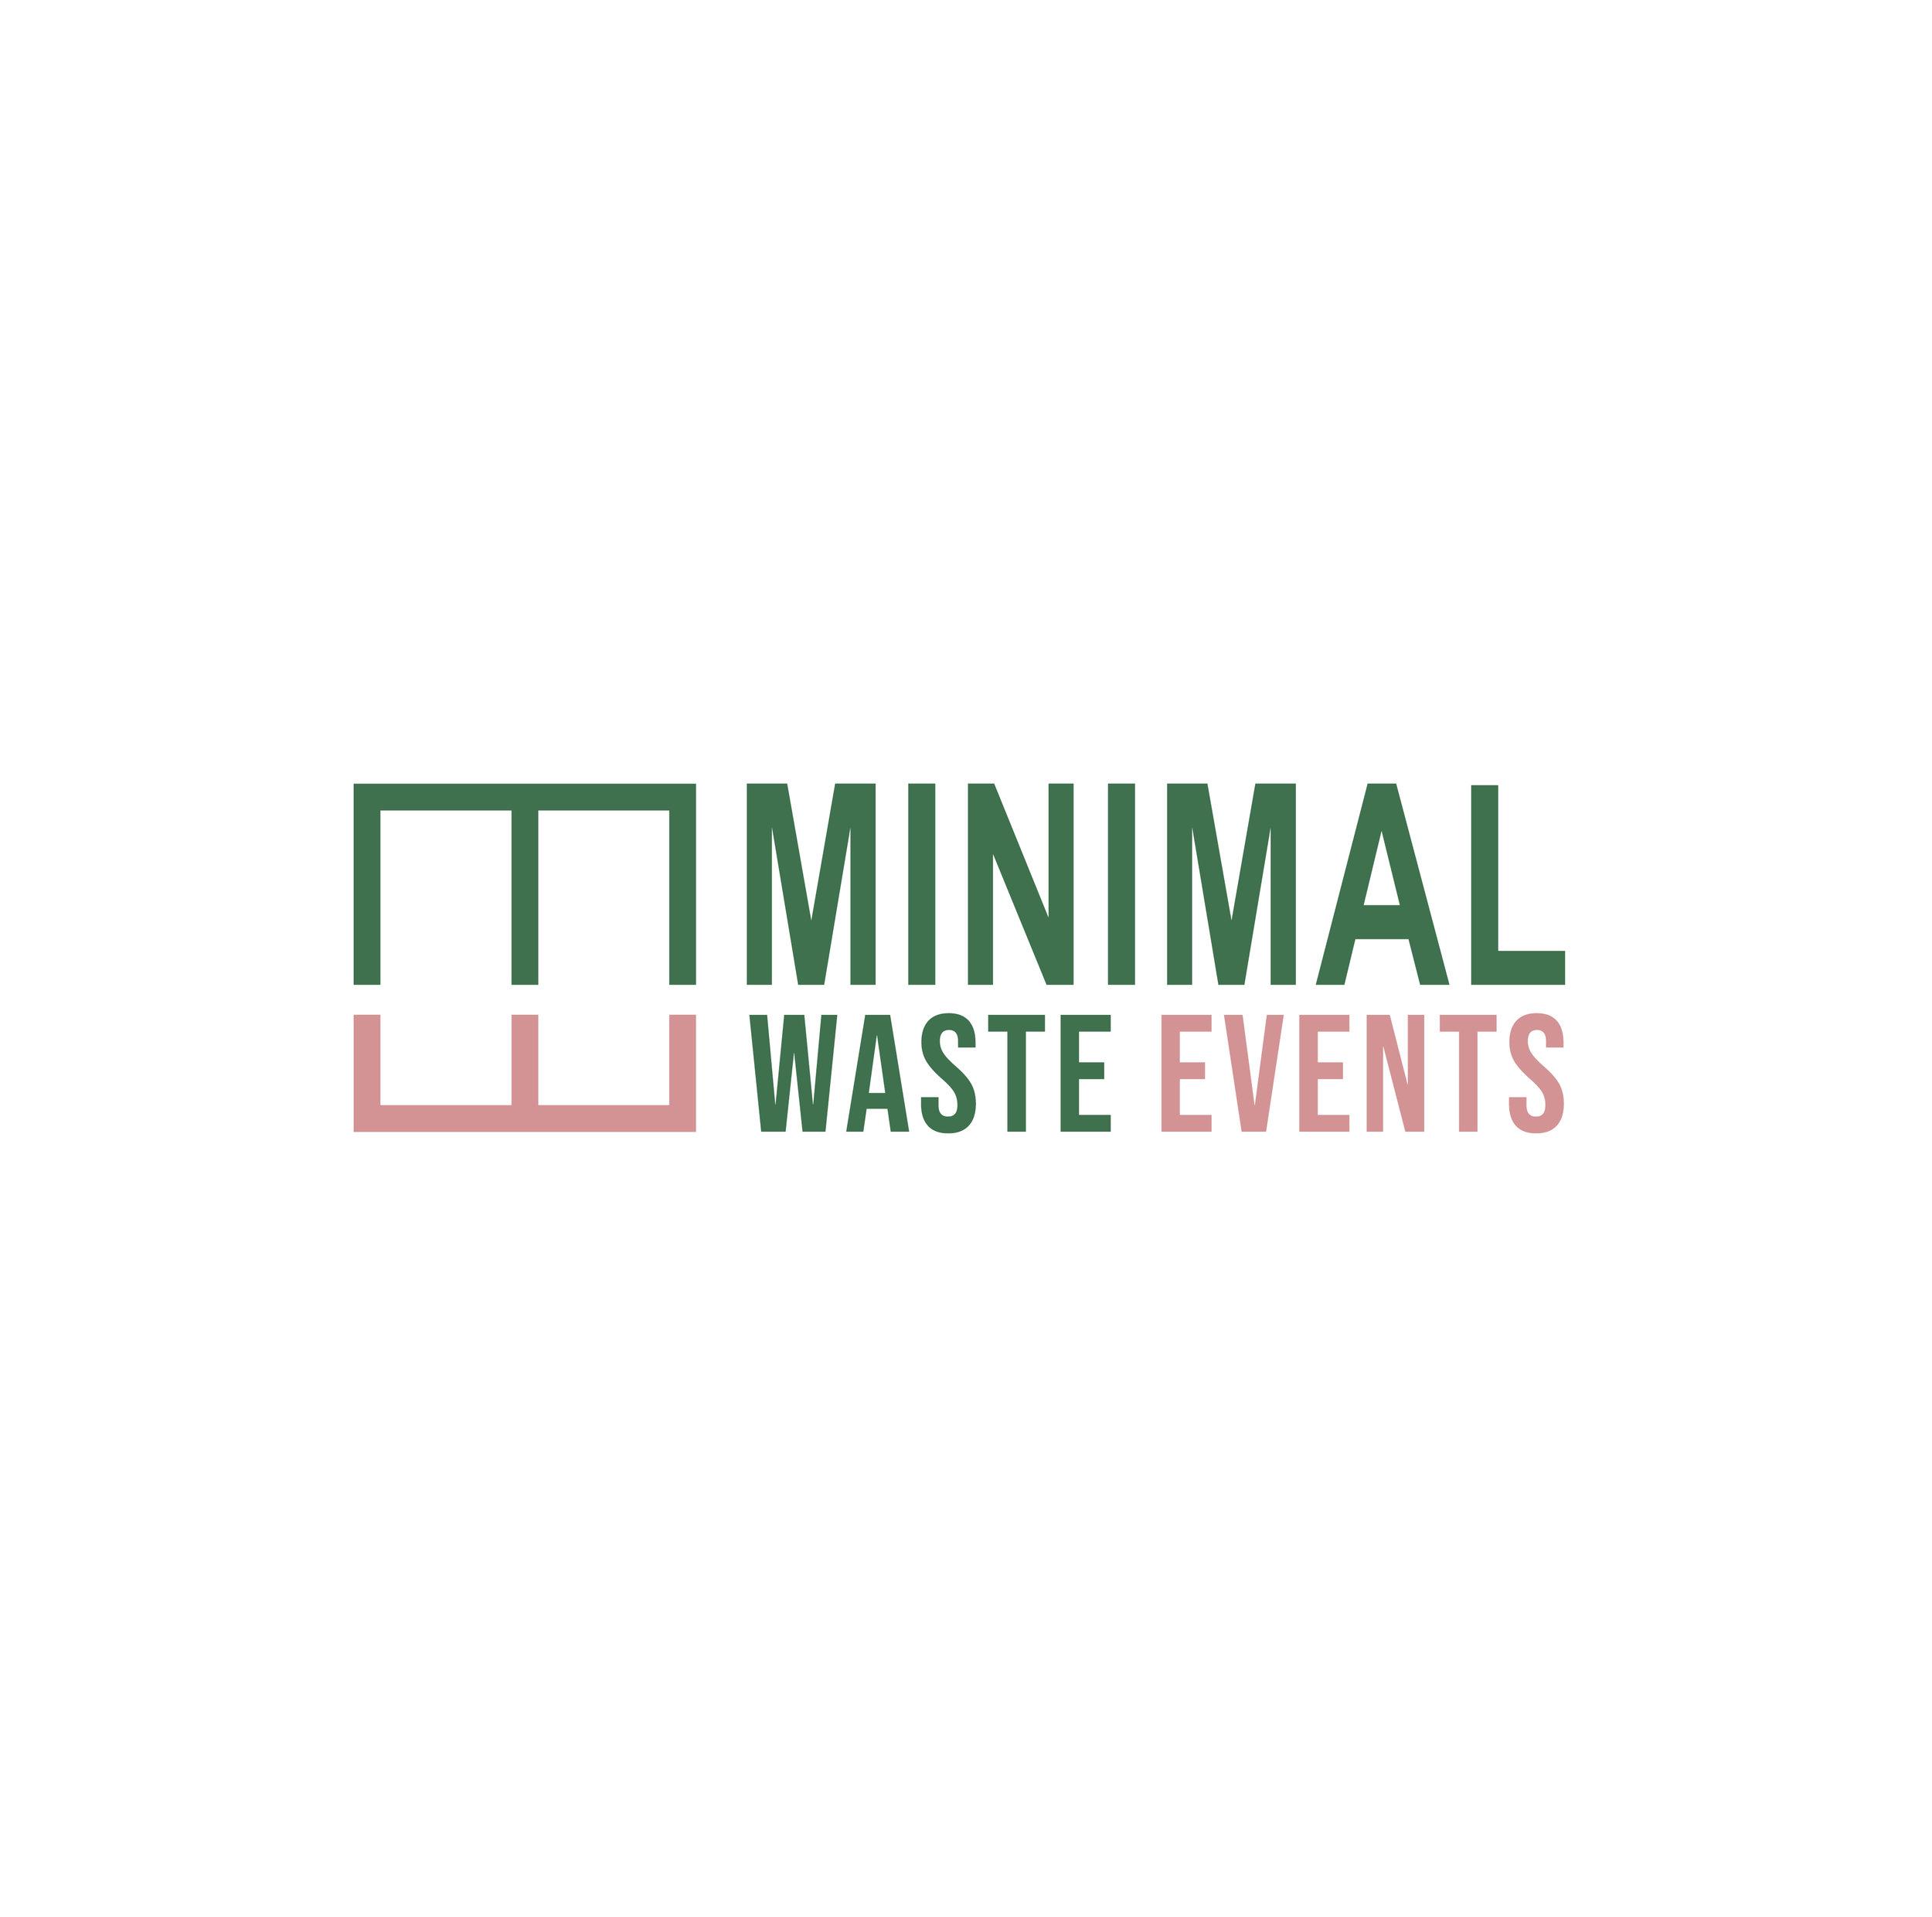 Minimal Waste Events (RGB White).jpg